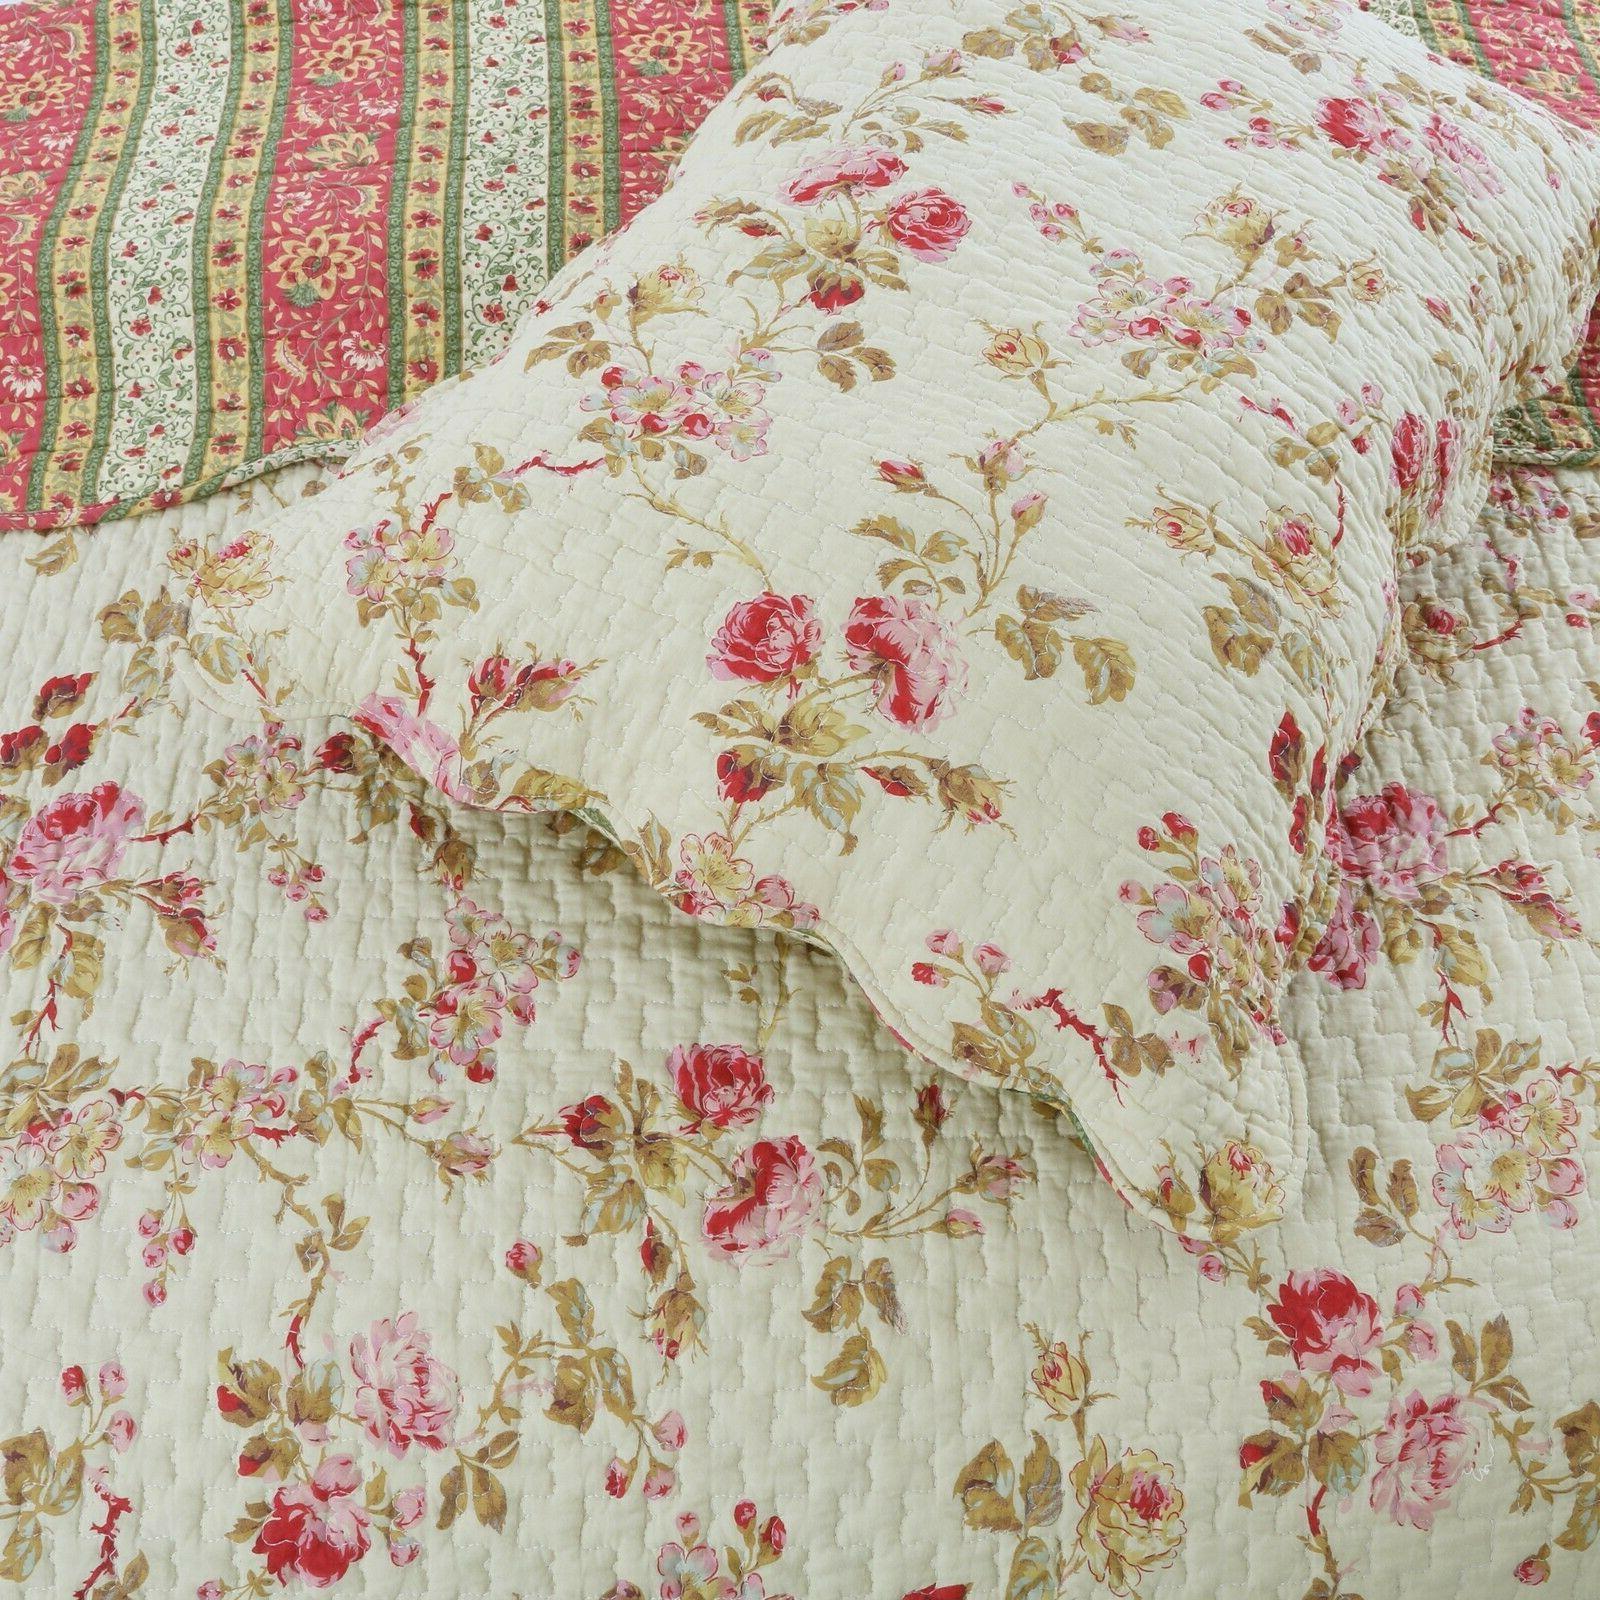 Vintage 3-Piece Reversible Quilt Bedspread, Coverlet